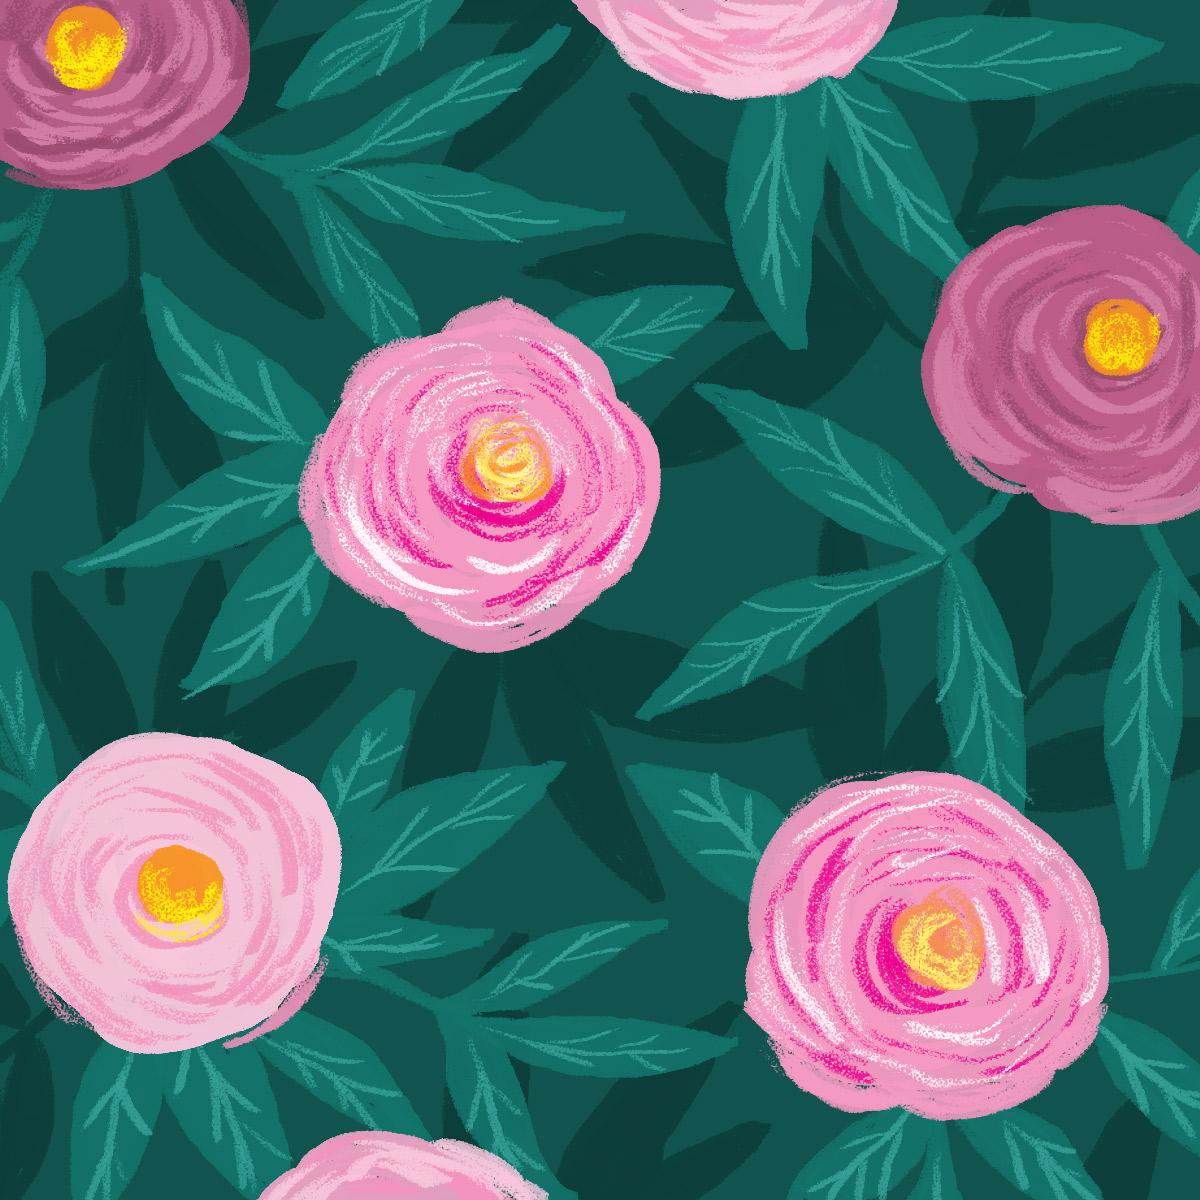 2018-02_FloralPatterns_04.jpg